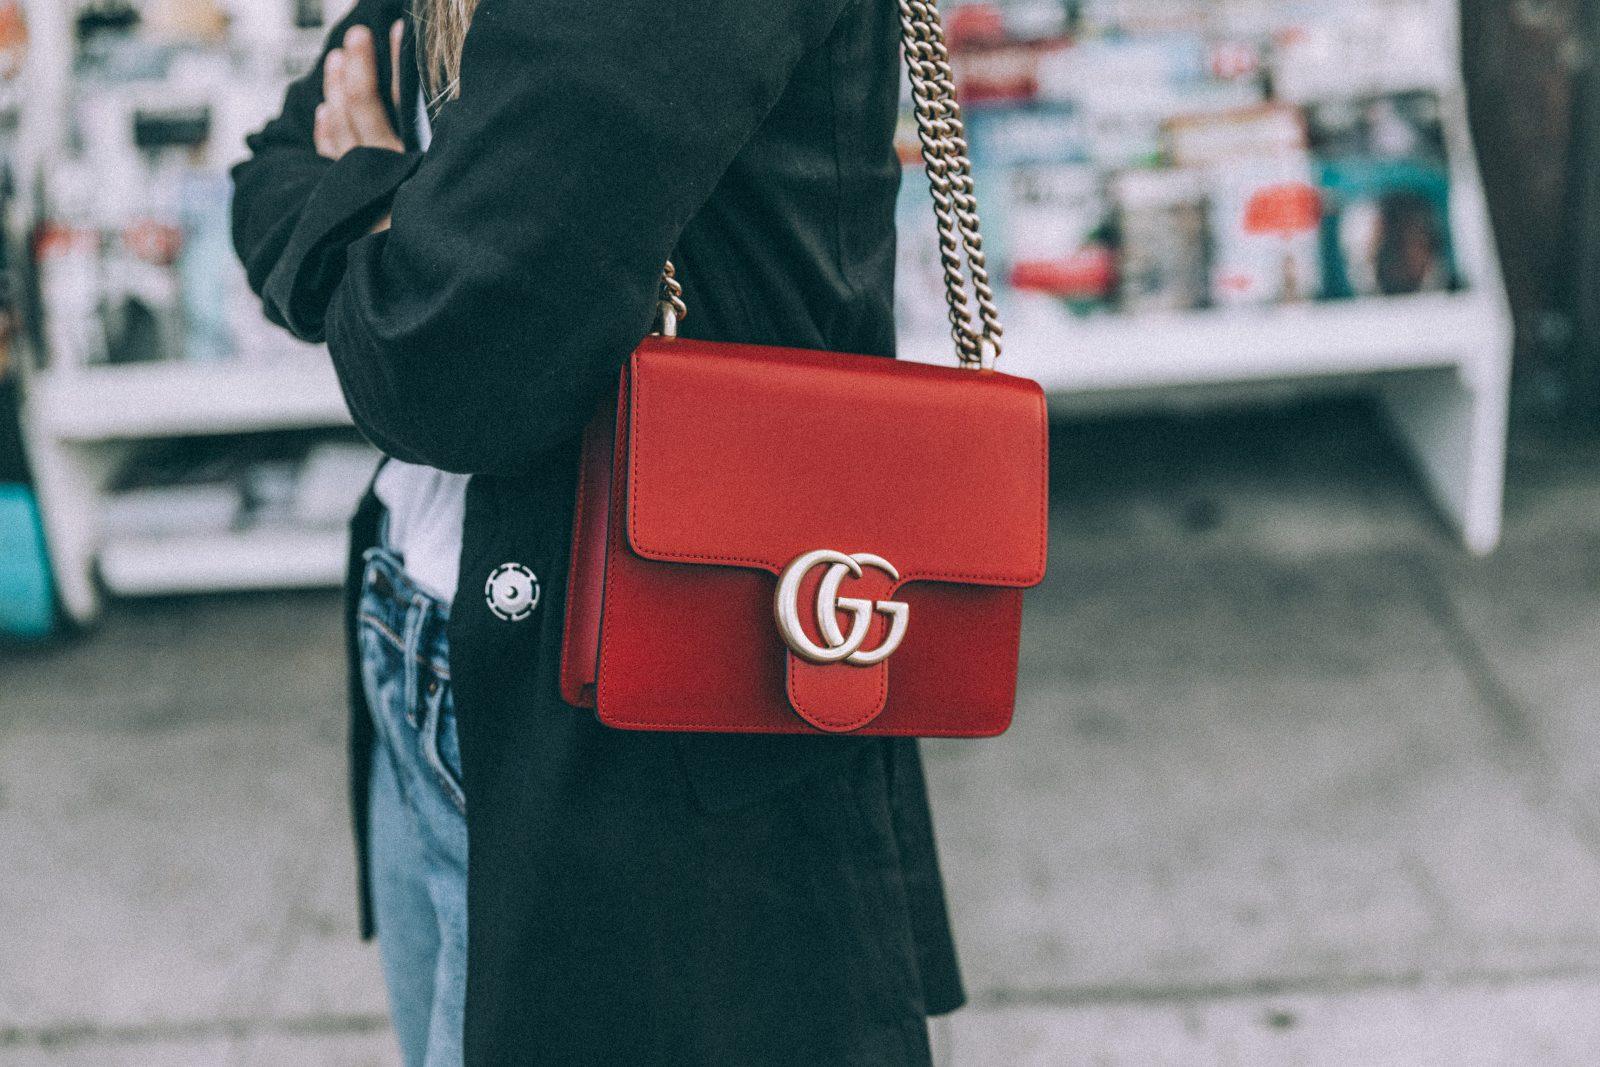 red_bag-snake_boots-gucci-levis-jeans-denim-iro_paris-black_blazer-los_angeles-la-fairfax-outfit-street_style-collage_vintage-35